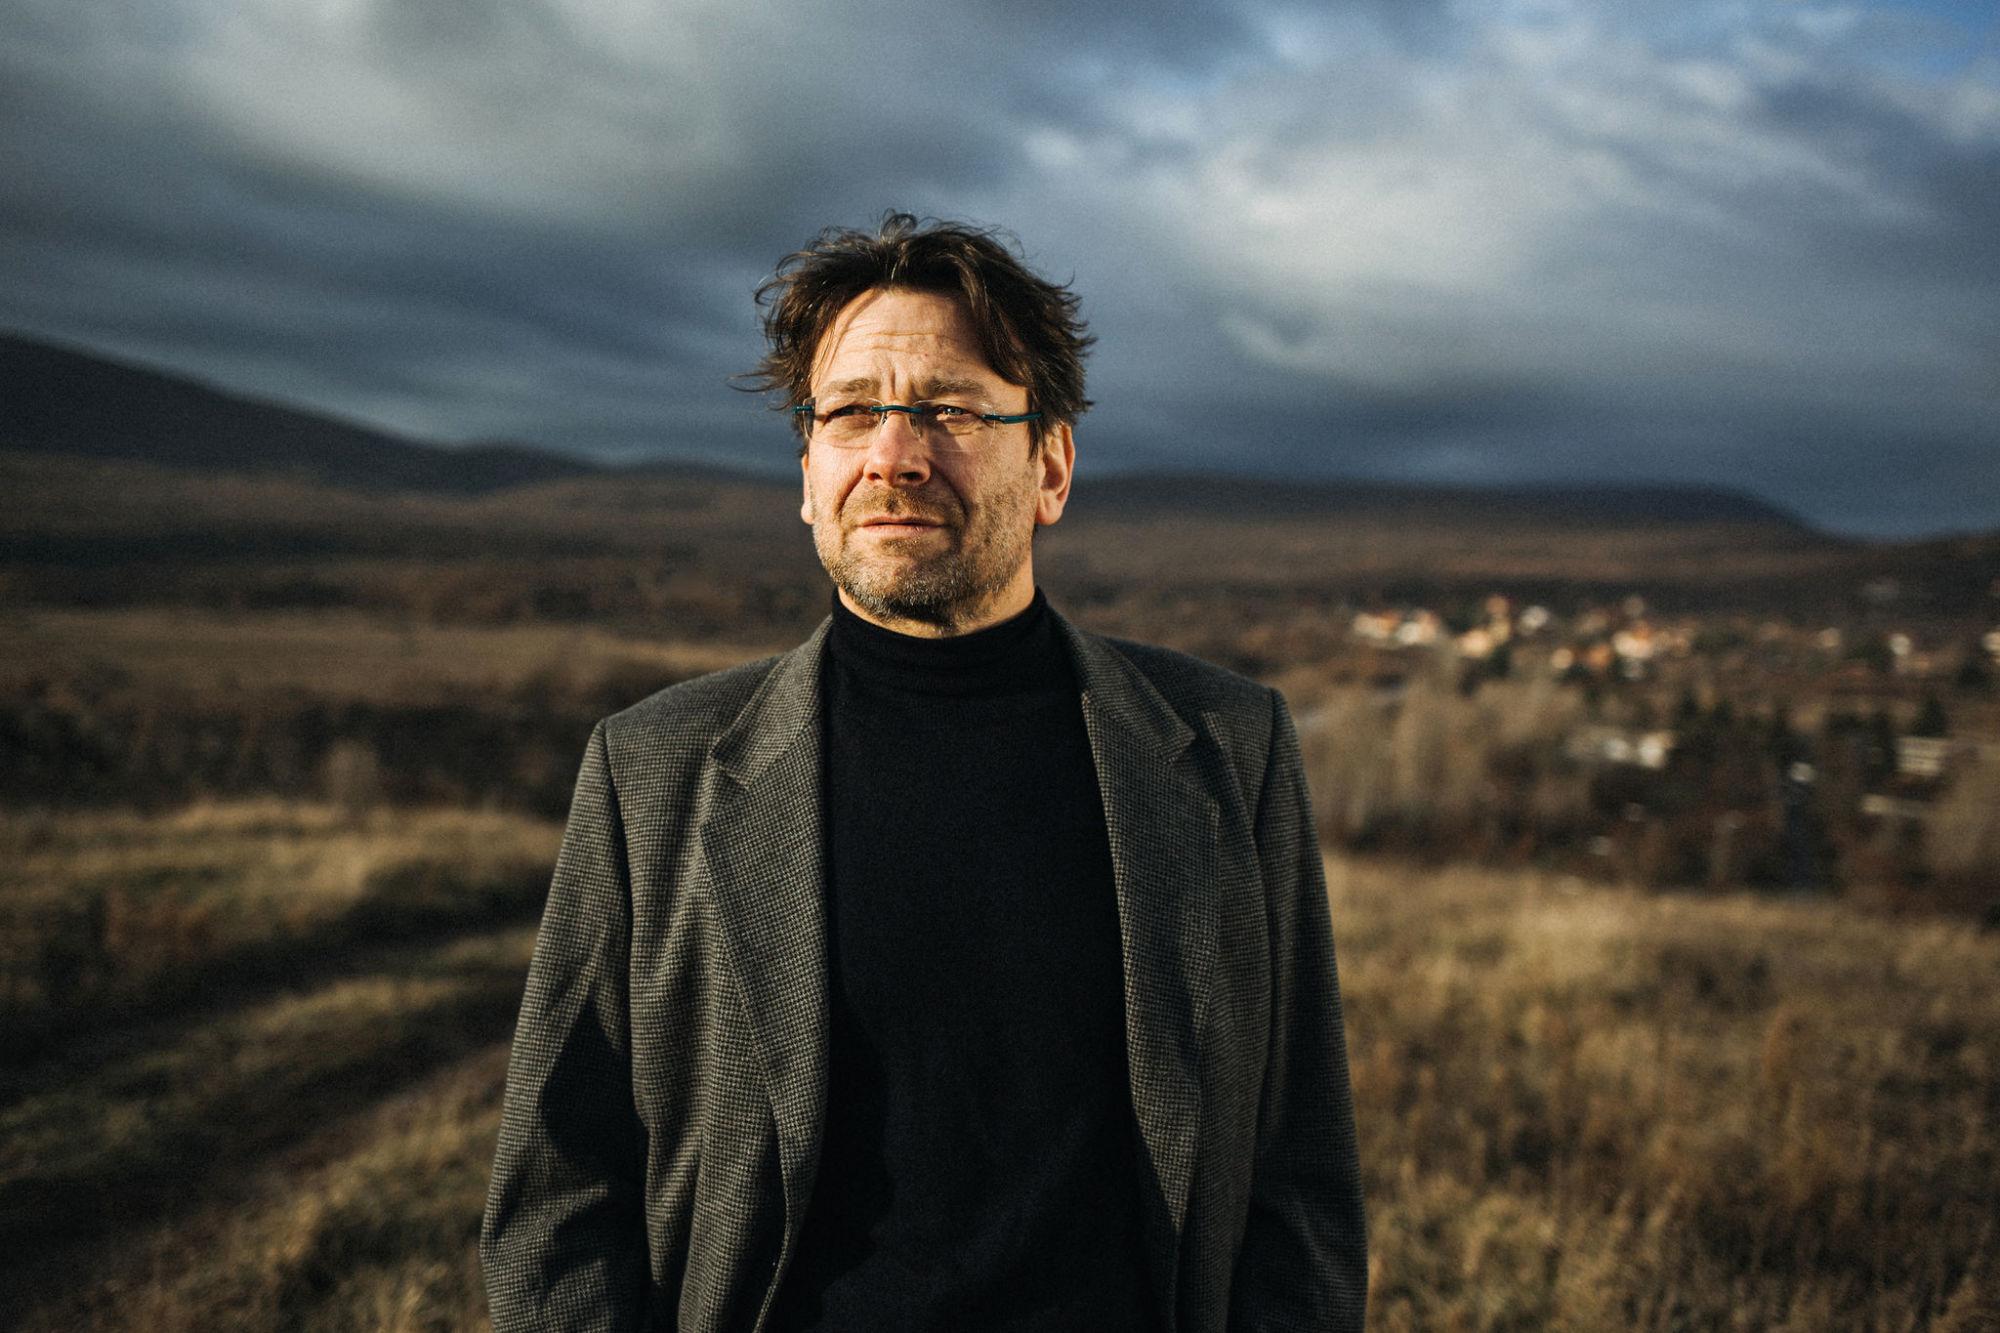 András Lovasi